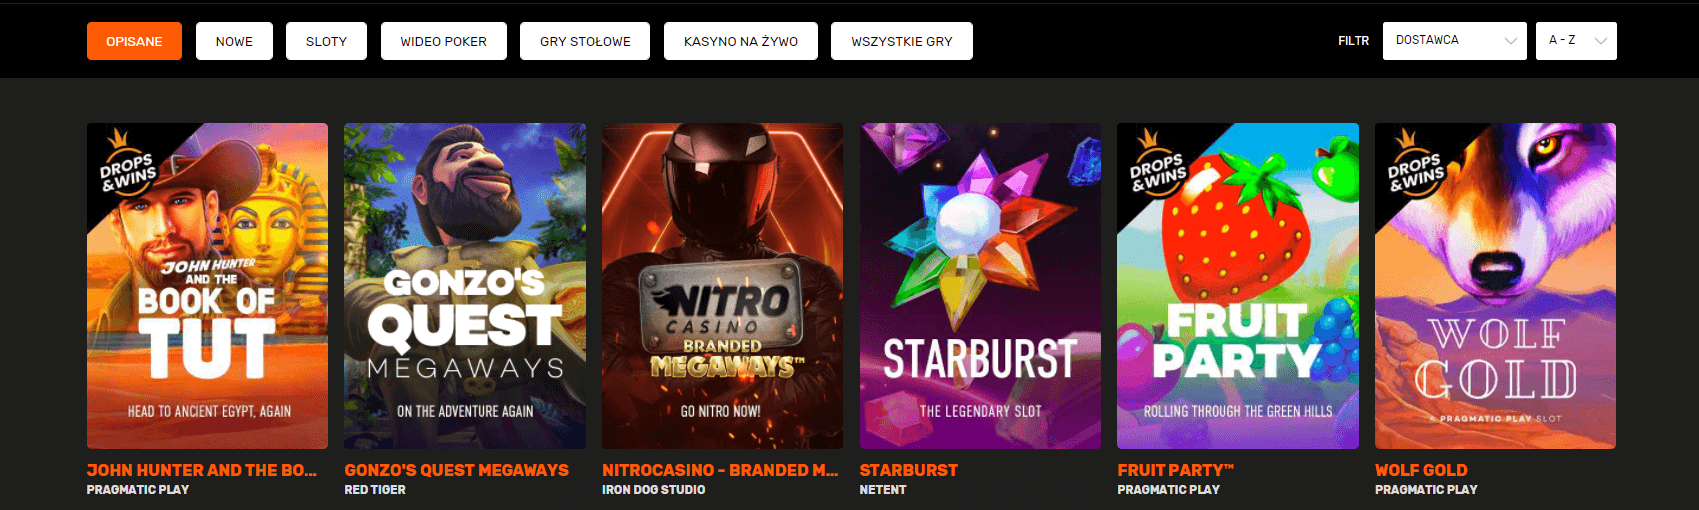 nitro casino gry hazardowe sloty screenshot